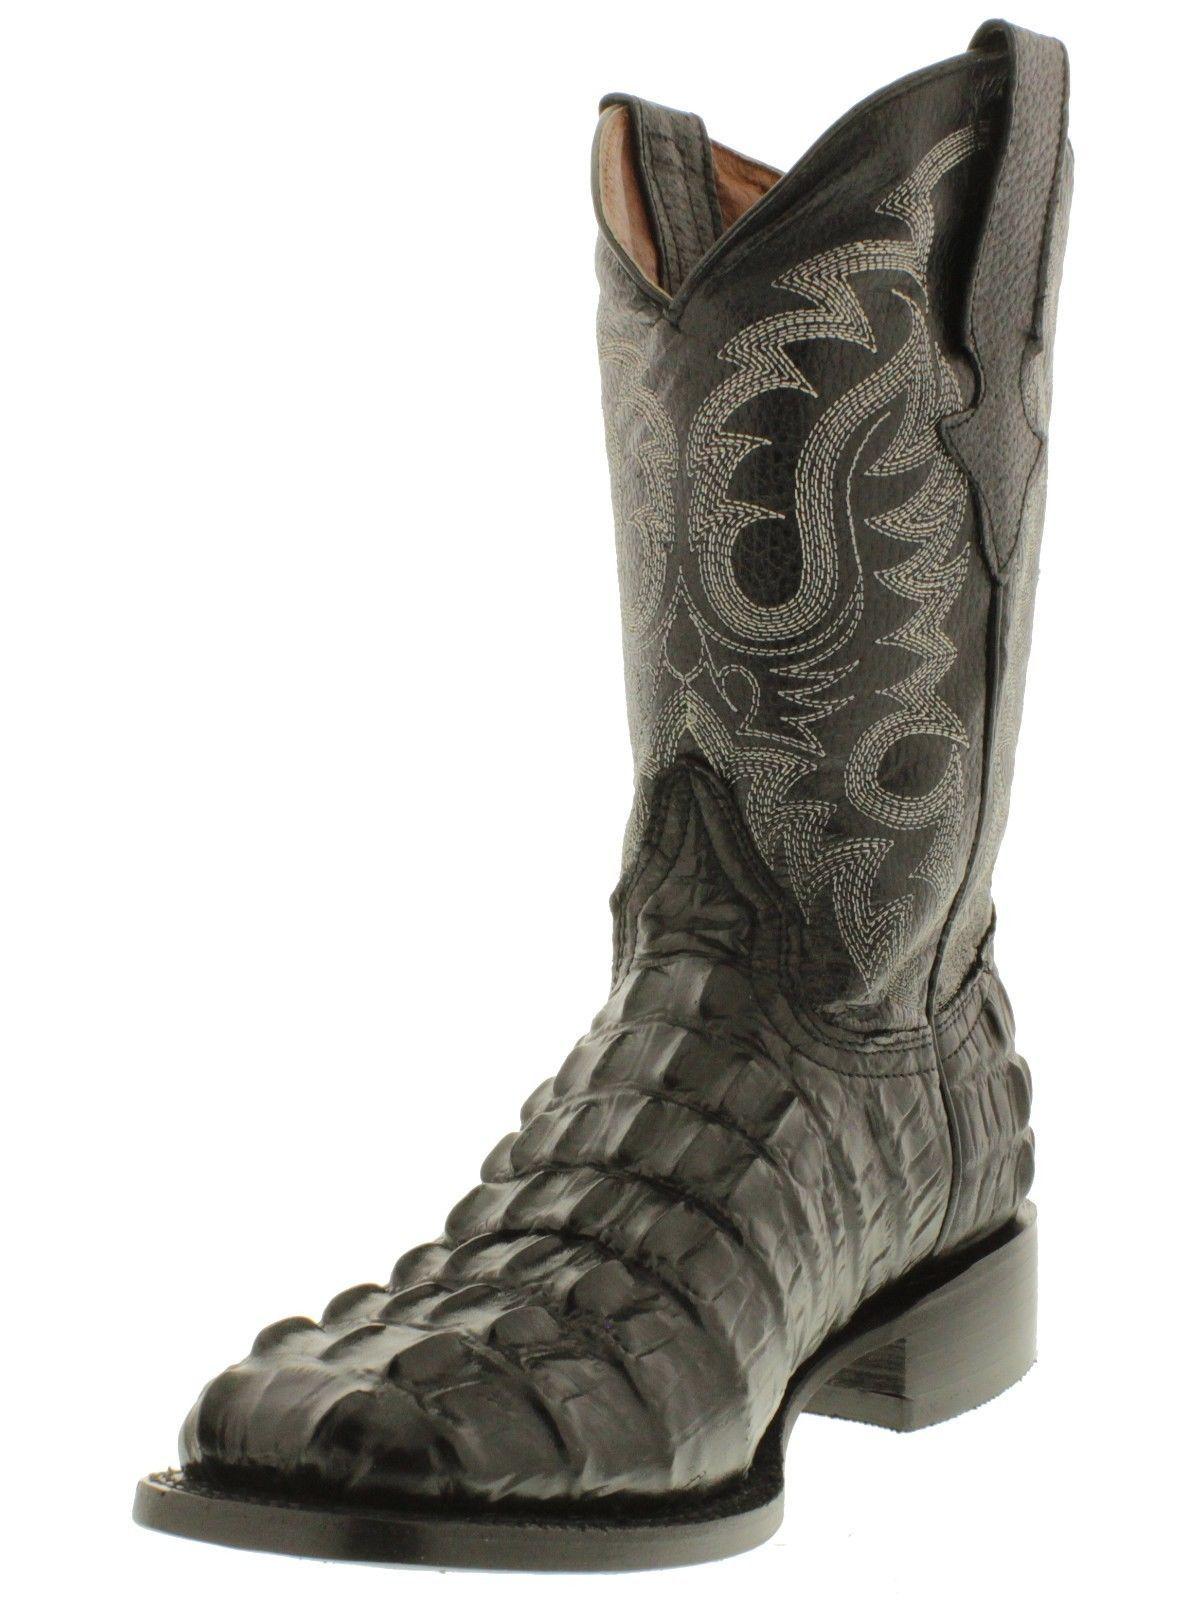 Men's Natural Full Crocodile Tail Print Cowboy Boots Round Toe